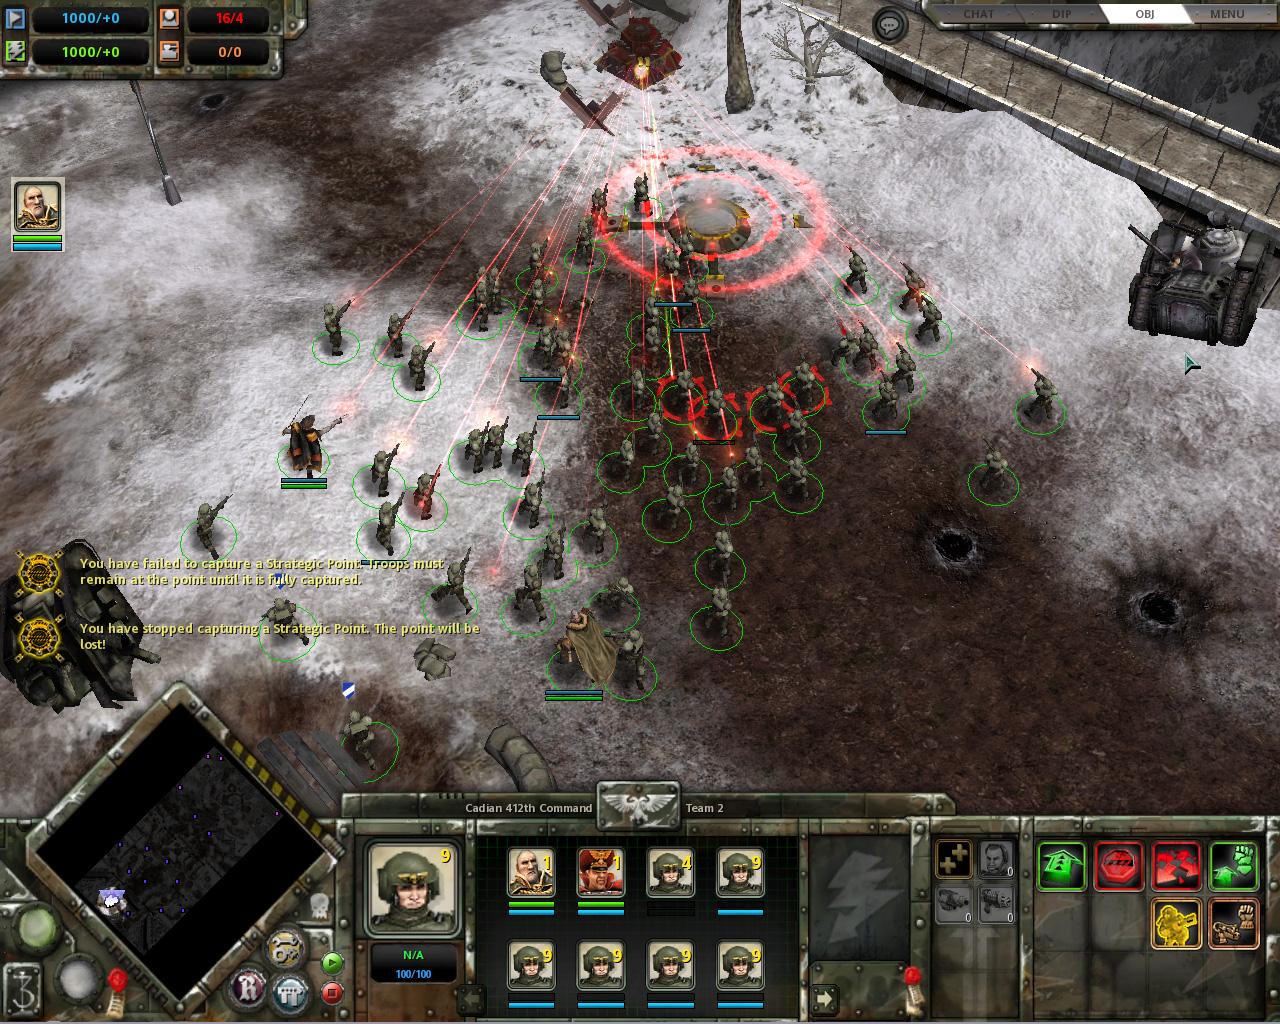 GamePatchPlanet - Warhammer 40,000: Dawn of War - Winter